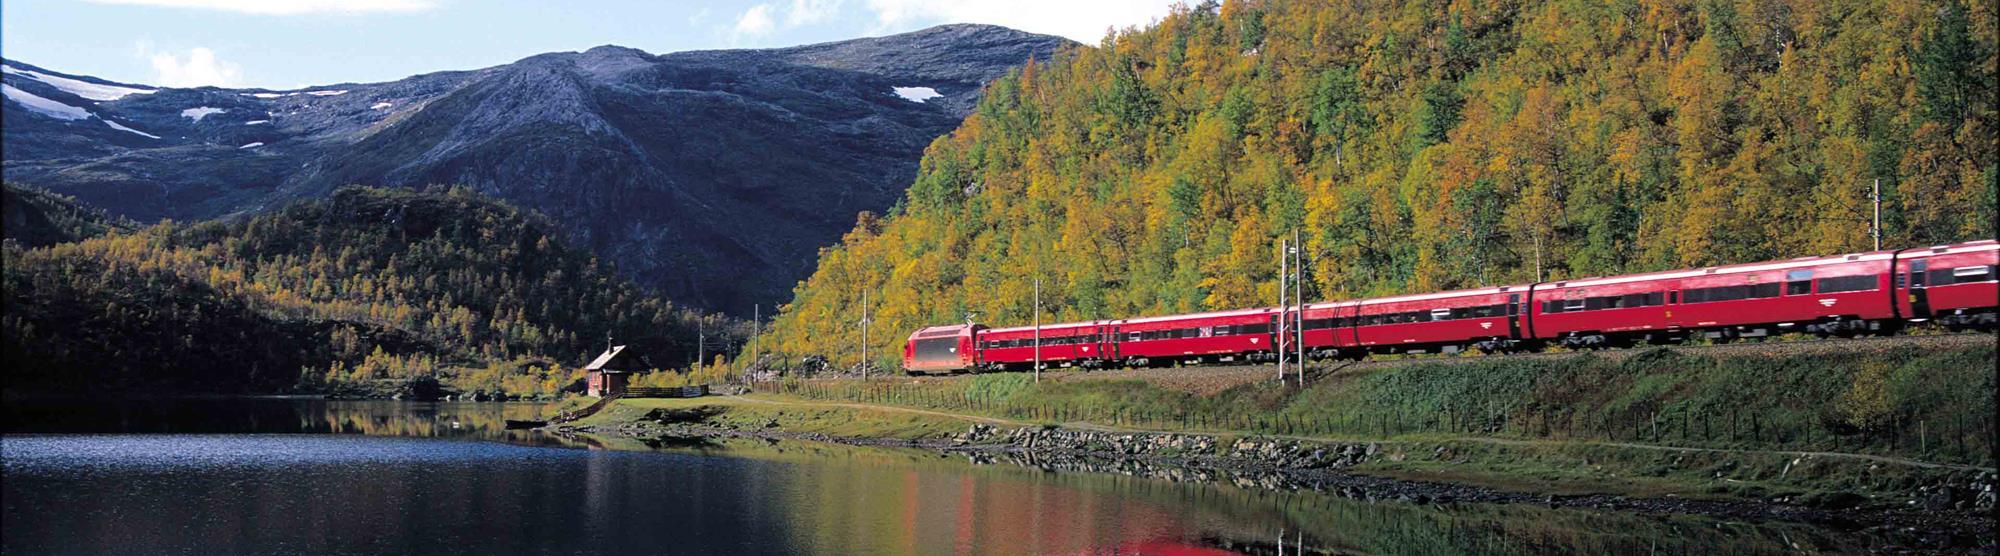 Oslo to Bergen train